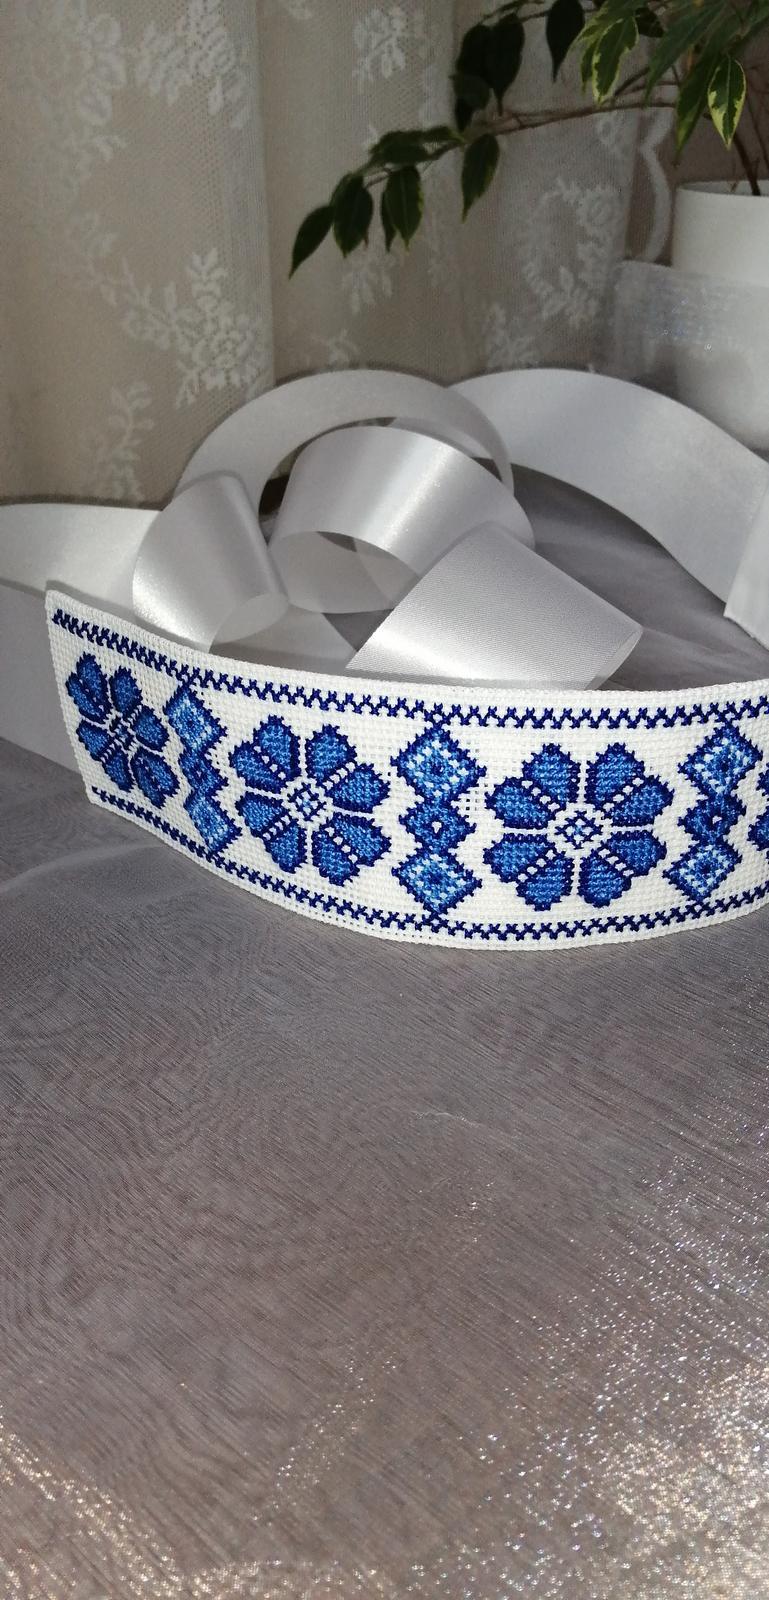 Svadobný opasok vyšívaný folklór modrý - Obrázok č. 1